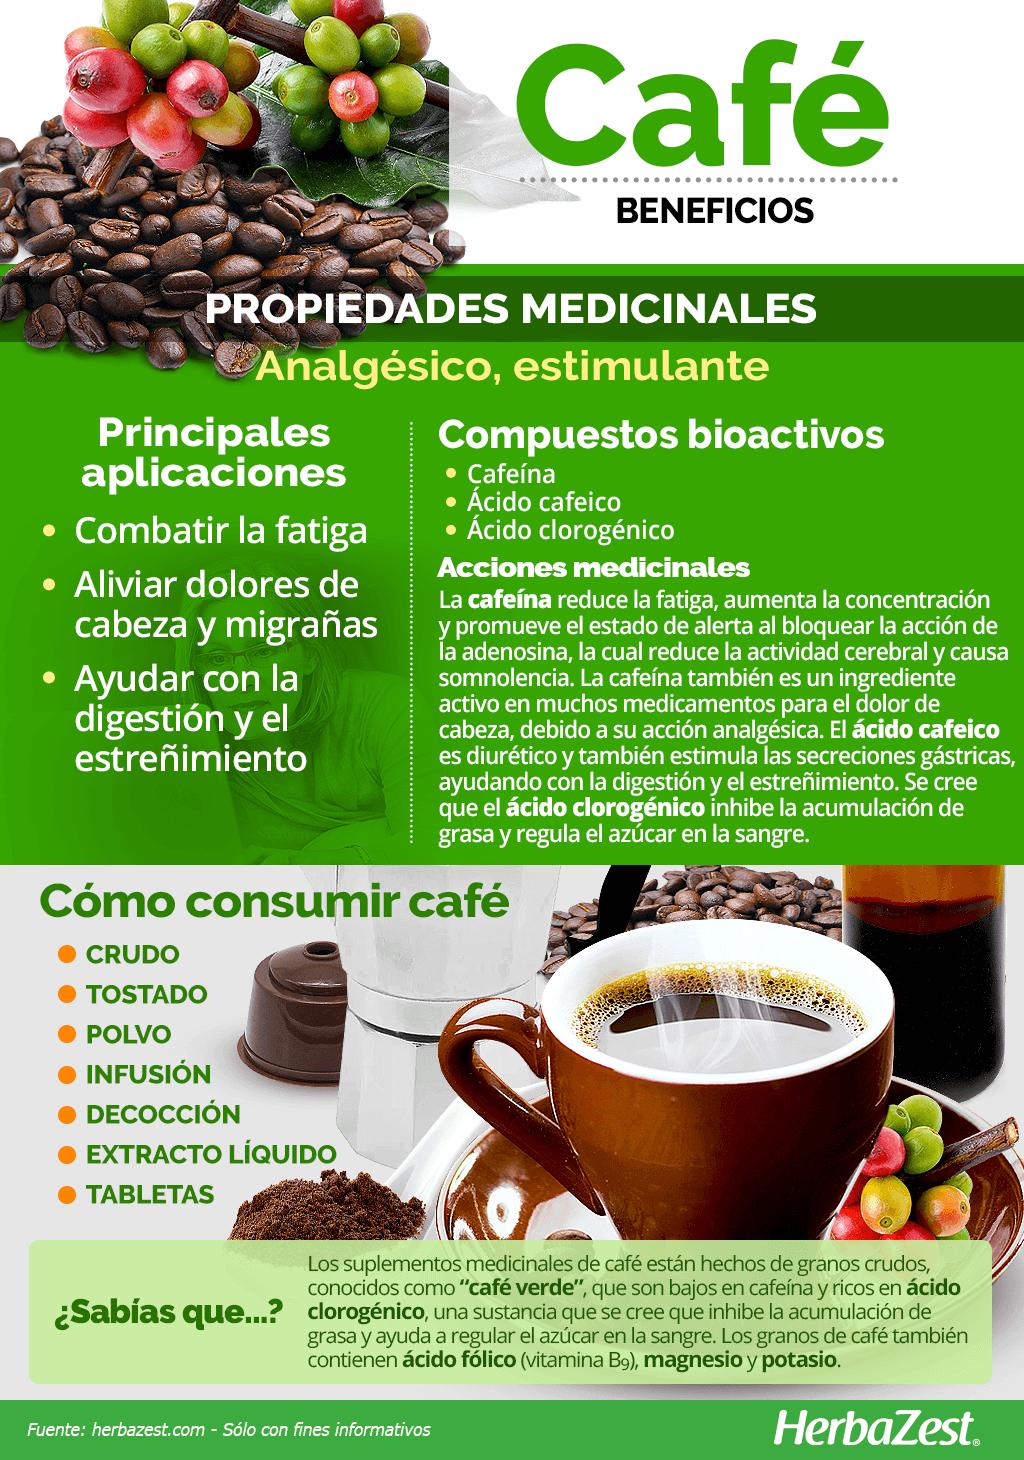 Café Herbazest Beneficios De Alimentos Frutas Y Verduras Beneficios Frutas Y Verduras